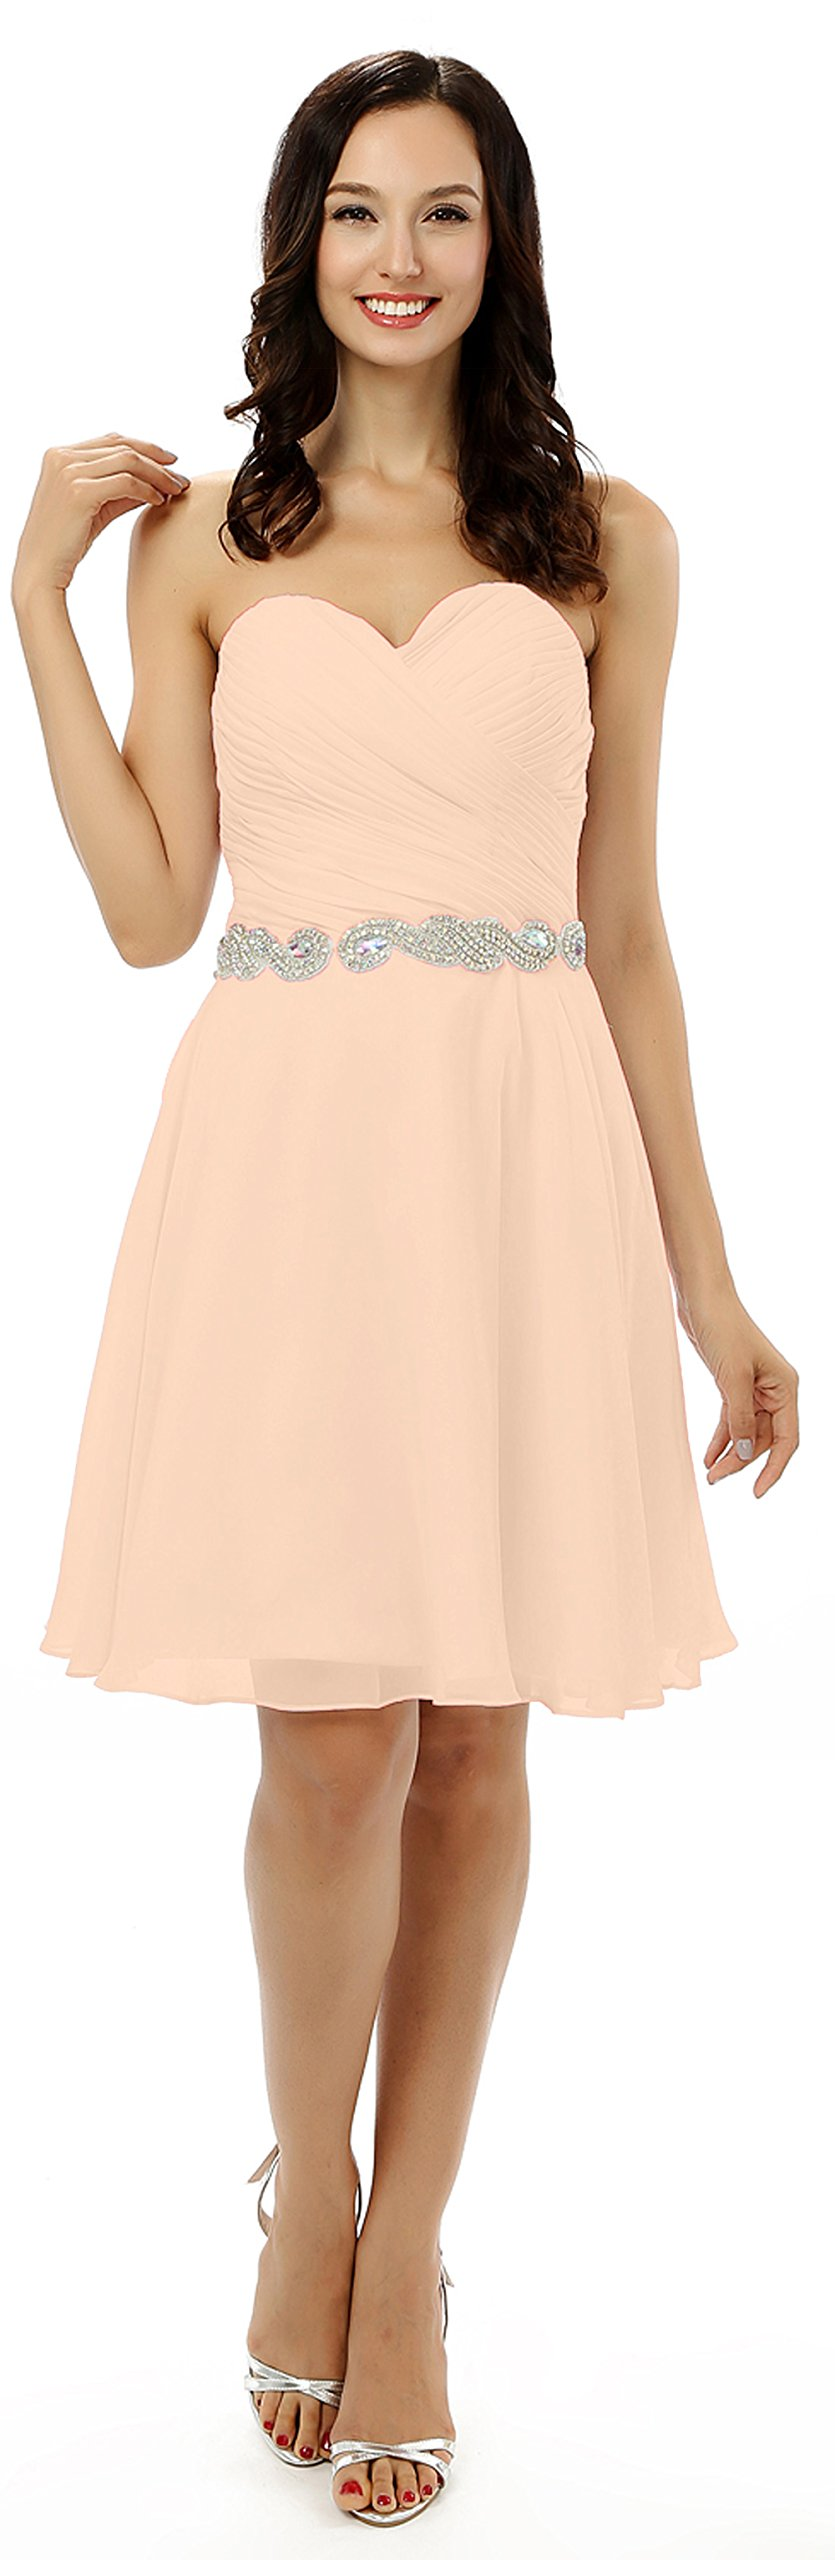 VaniaDress Women Sleeveless Short Bridesmaid Dress Evening Prom Gown V196LF Champagne US26W